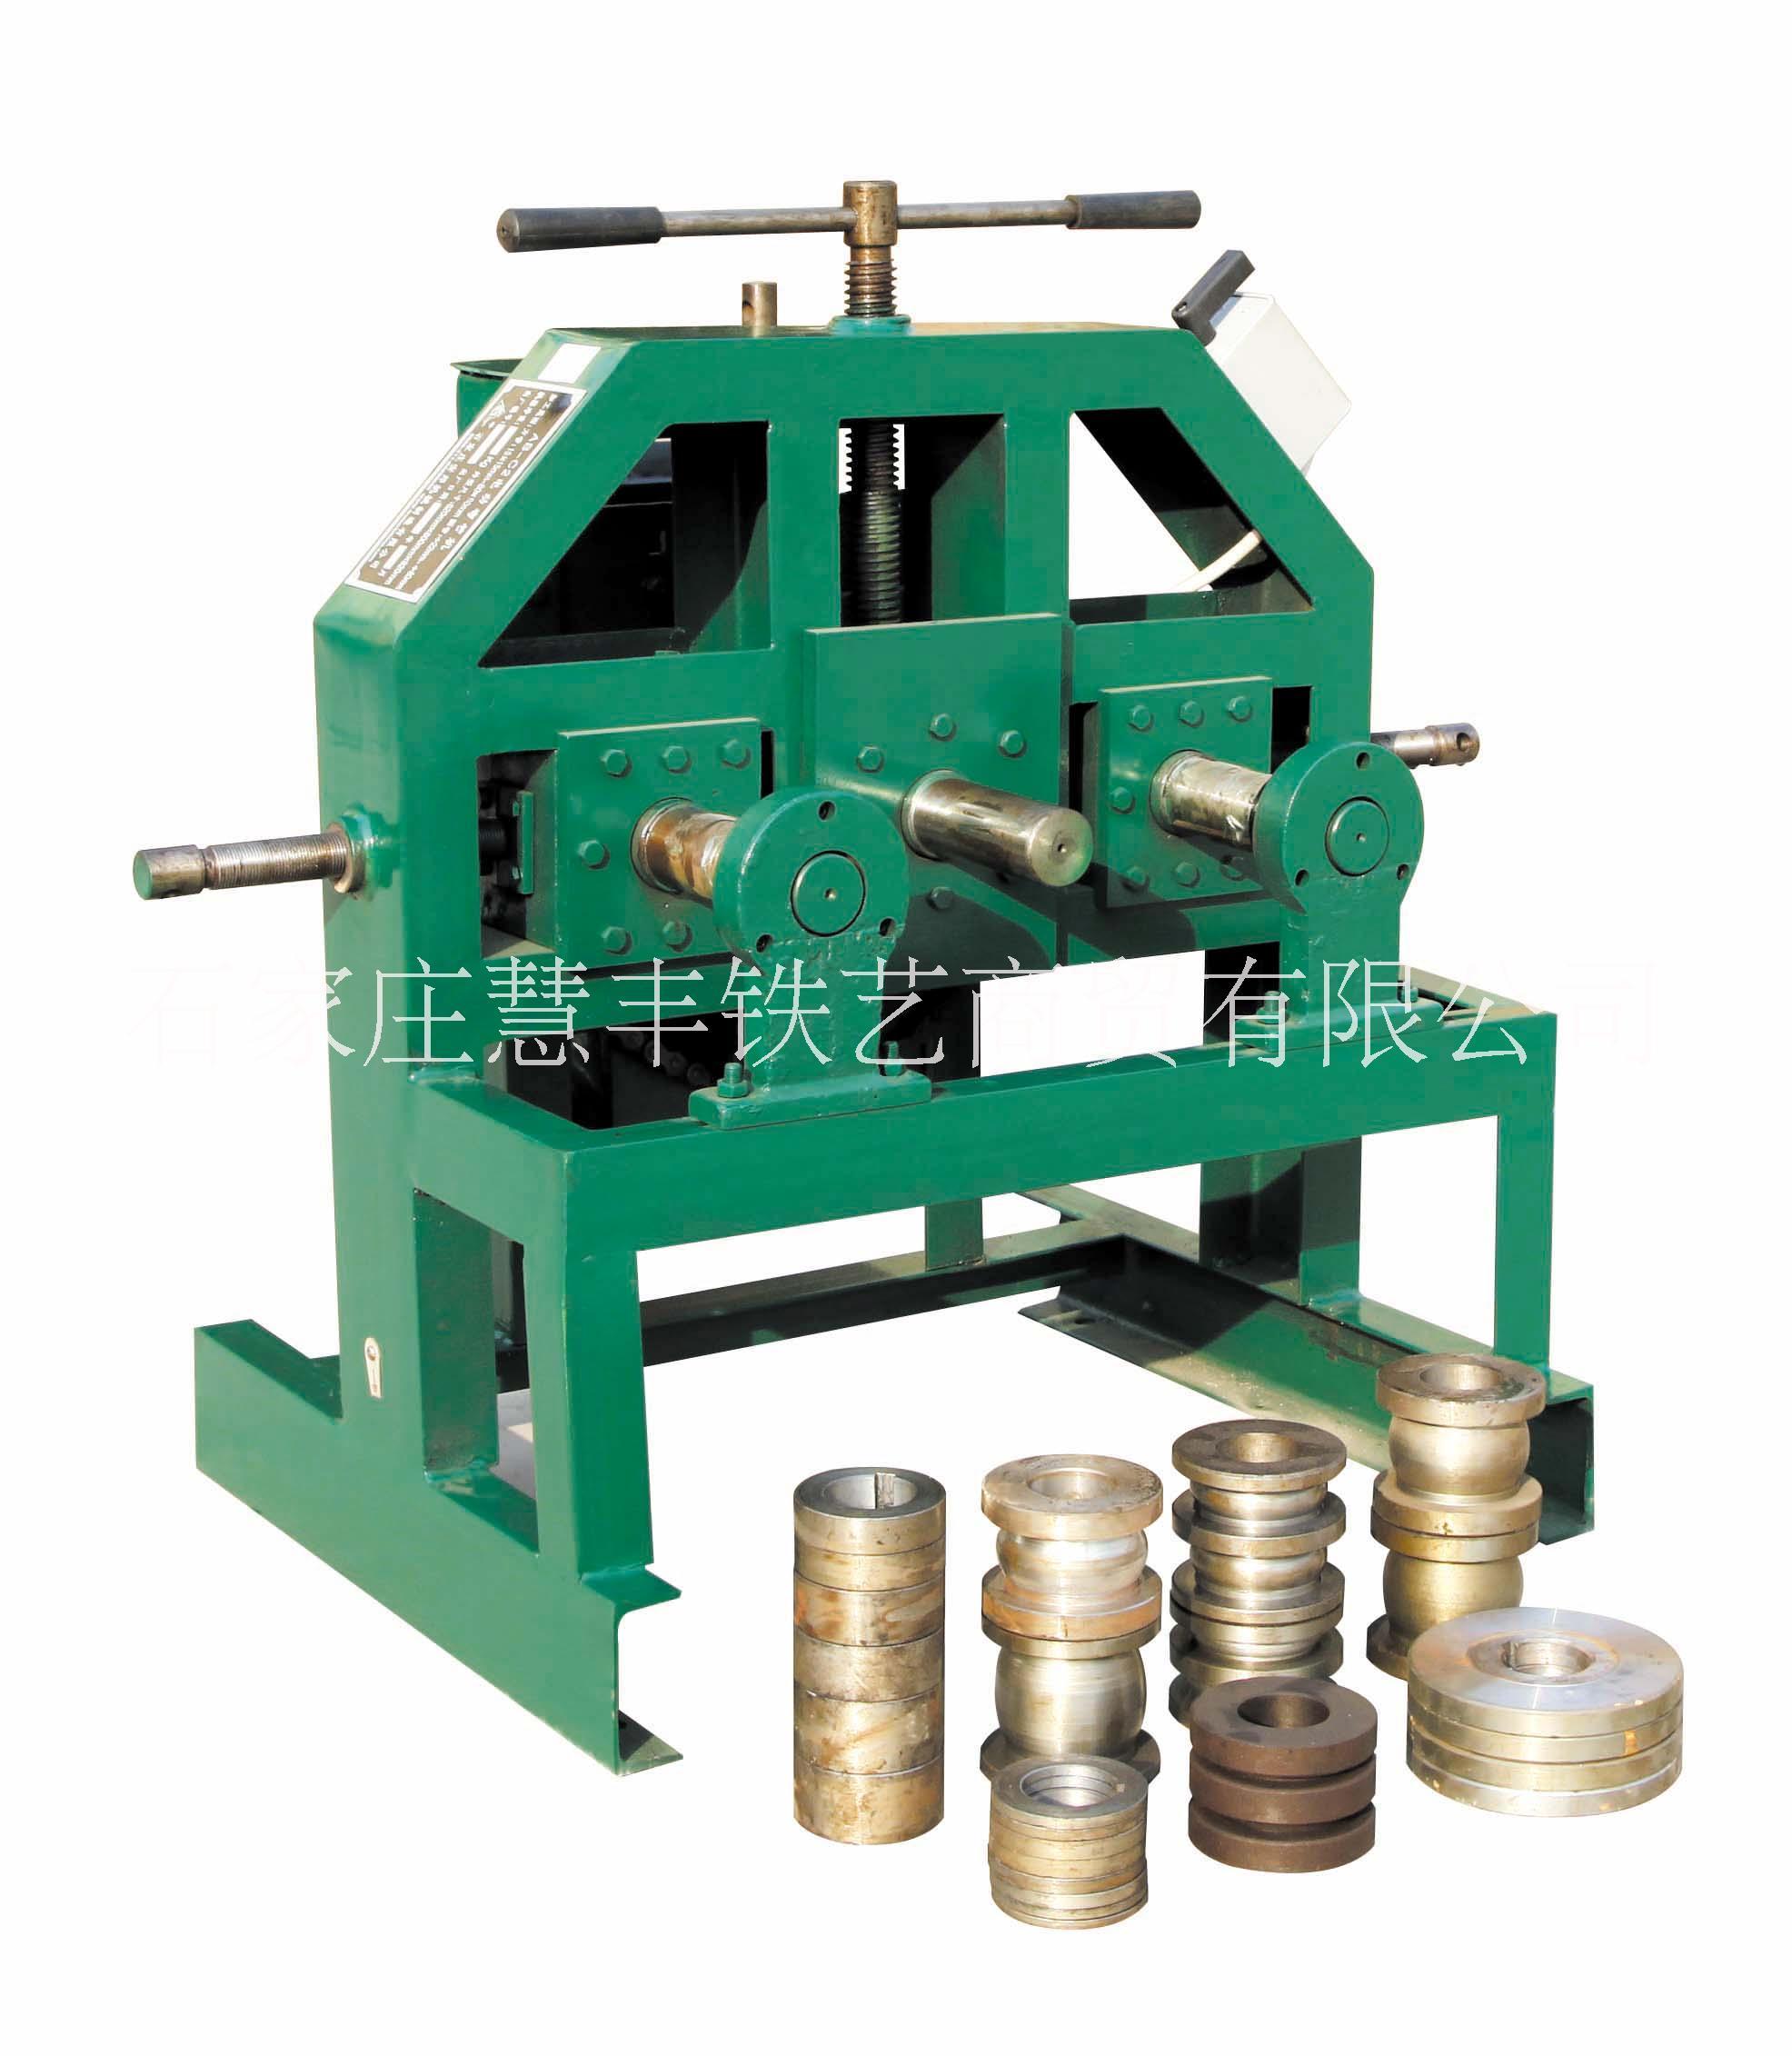 C2立式可调加强型电动弯管机,铁艺设备,铁艺机器